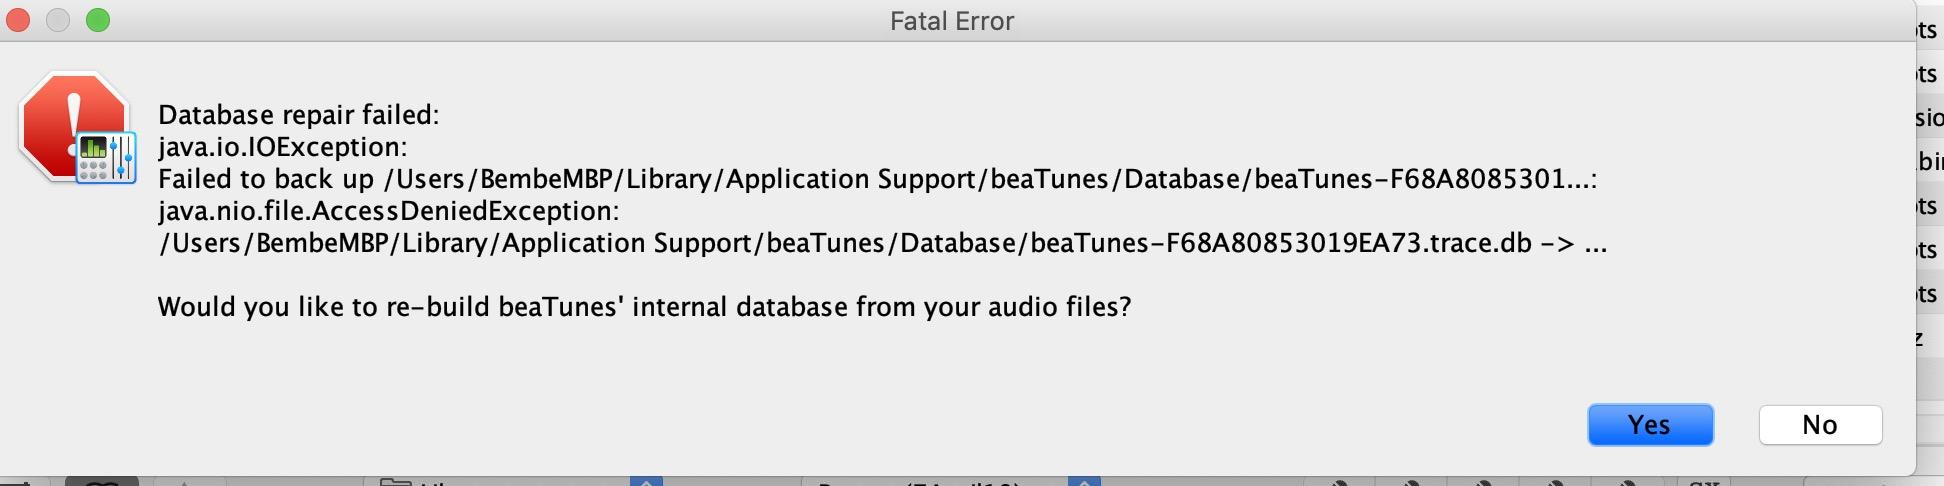 Error_when_repairing_database_1st_try_8april19